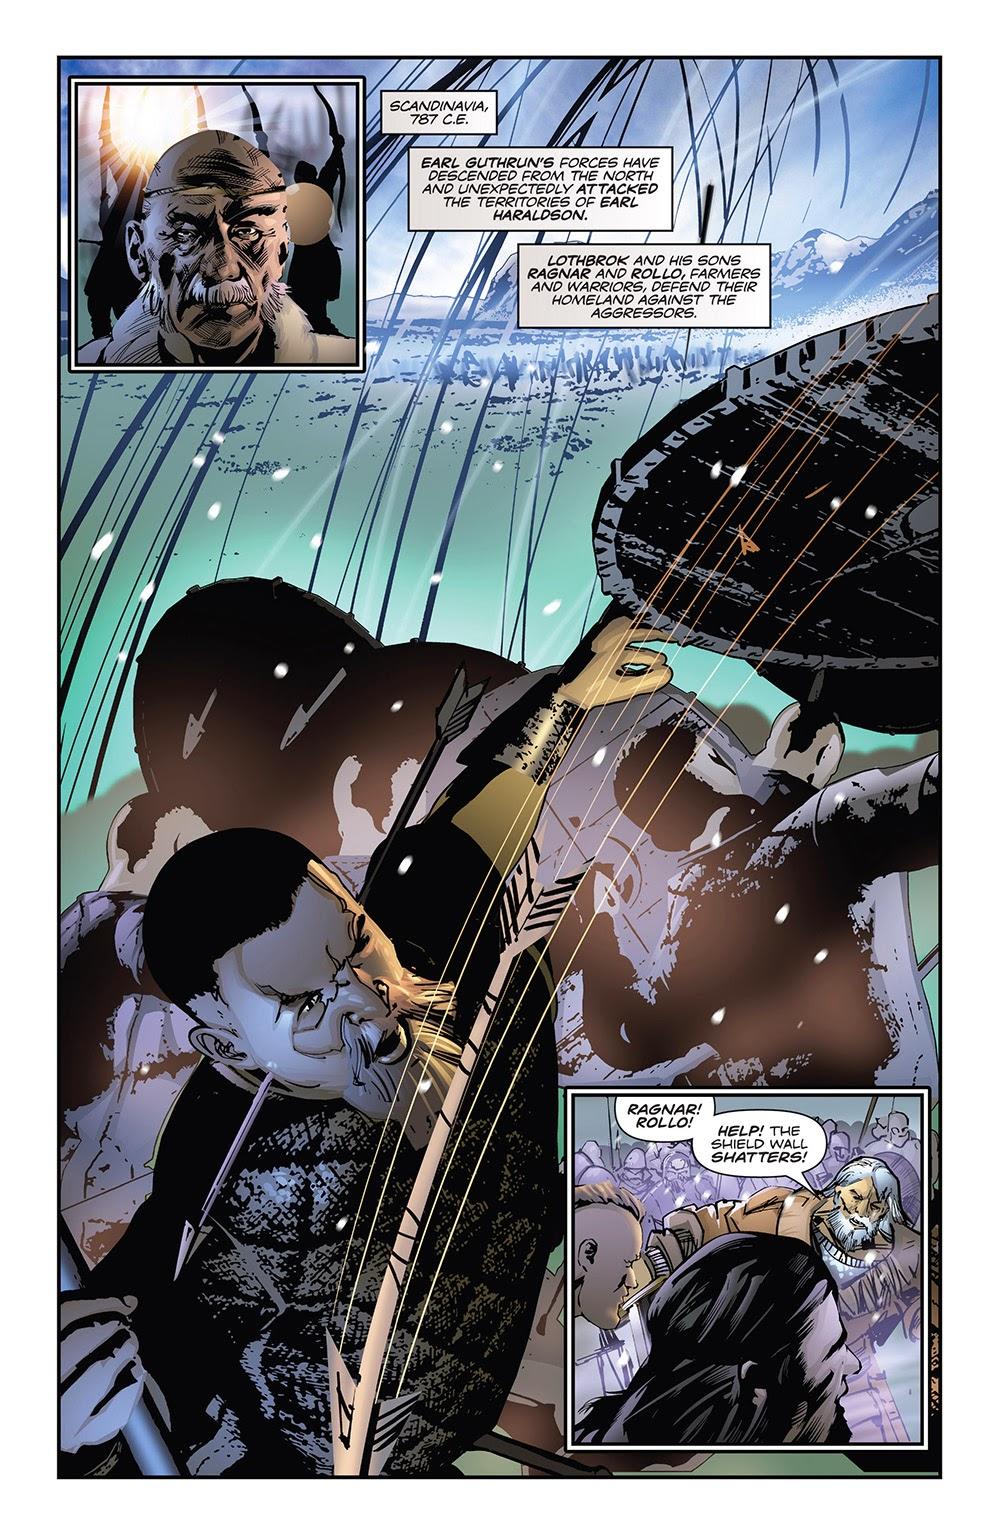 Vikings 001 (2014) ………………………………… | Viewcomic reading comics online